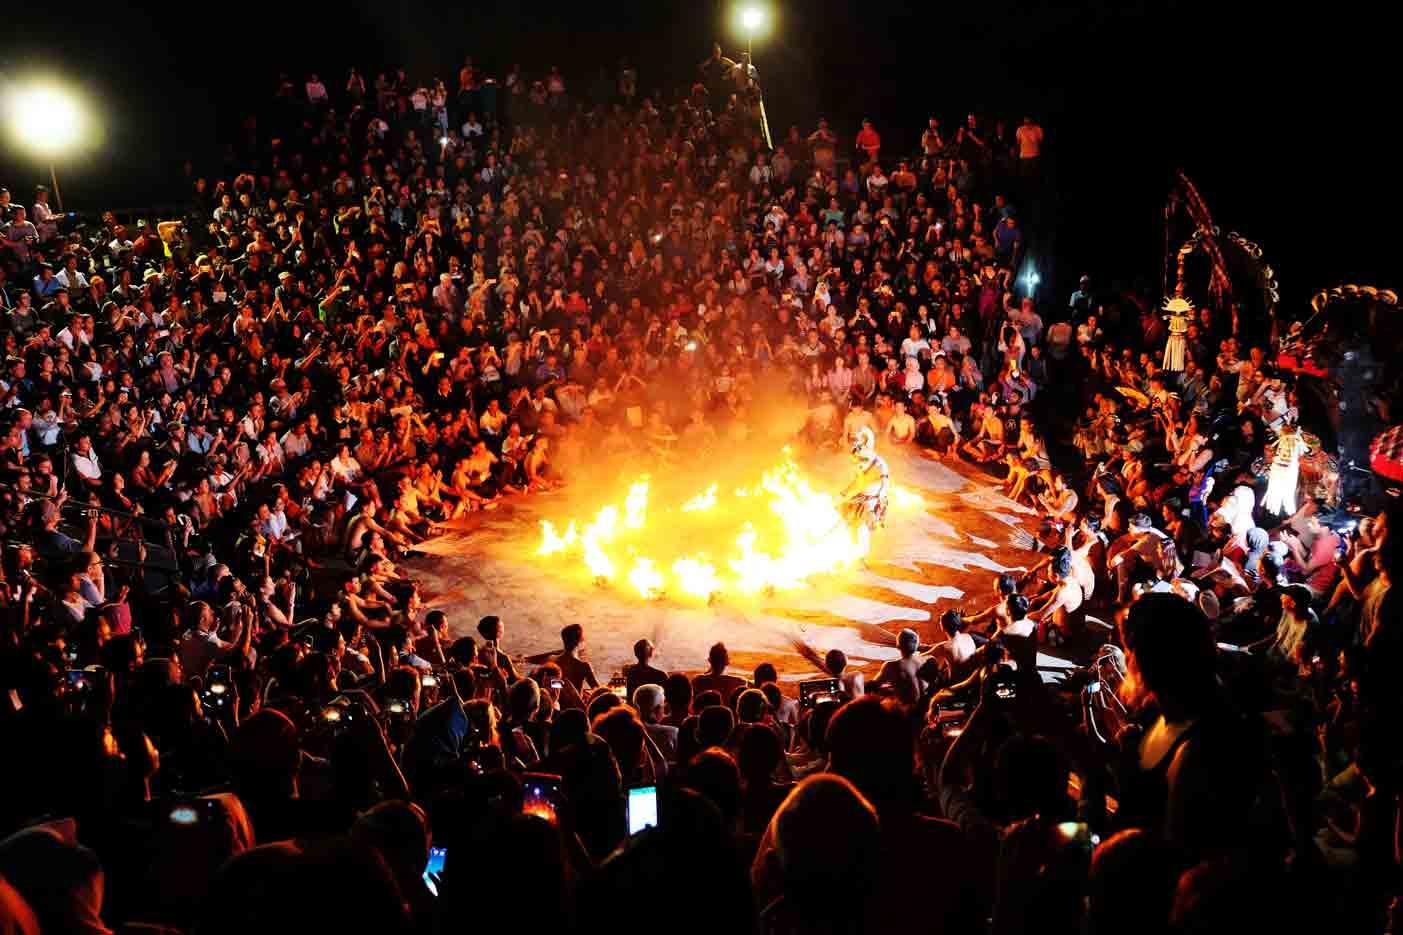 Hasil gambar untuk Kecak Fire Dance